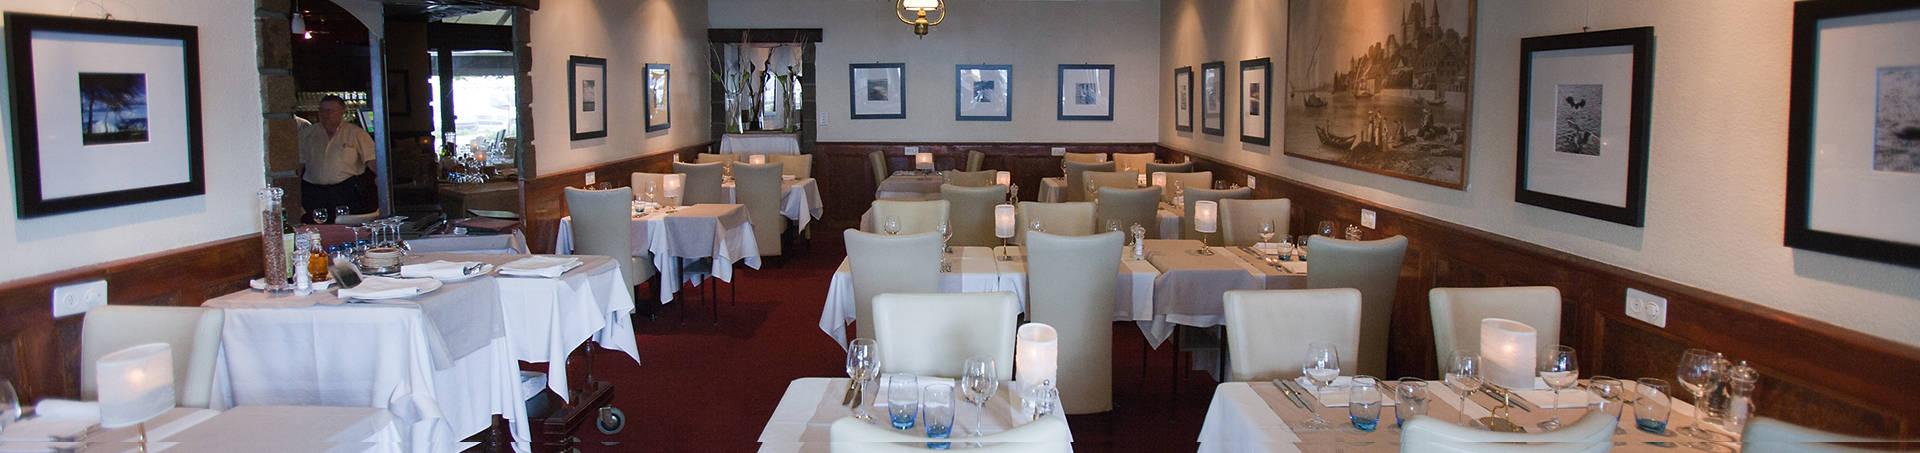 Le Léman Restorive 3 restaurants Nyon